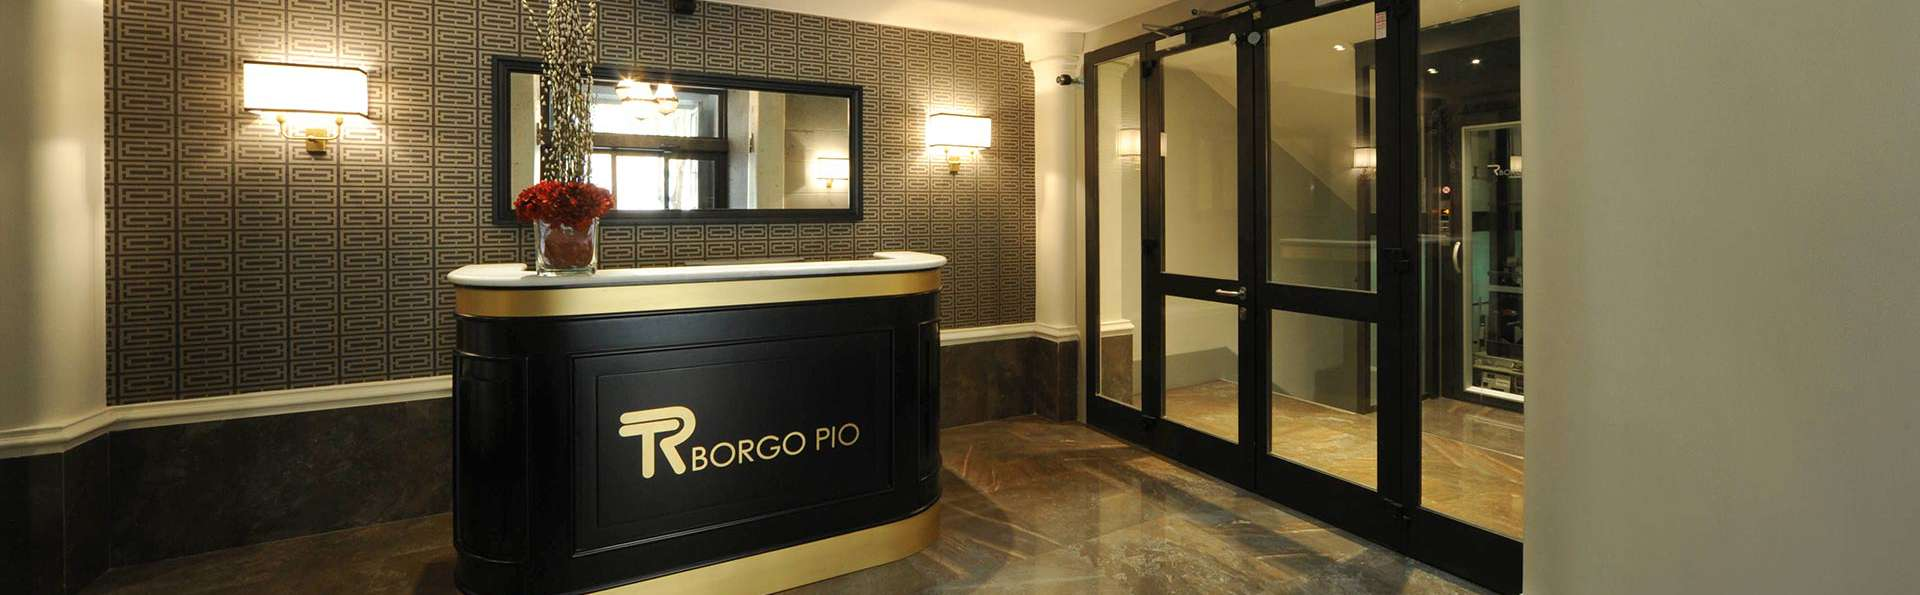 Trianon Borgo Pio - EDIT_LOBBY_02.jpg